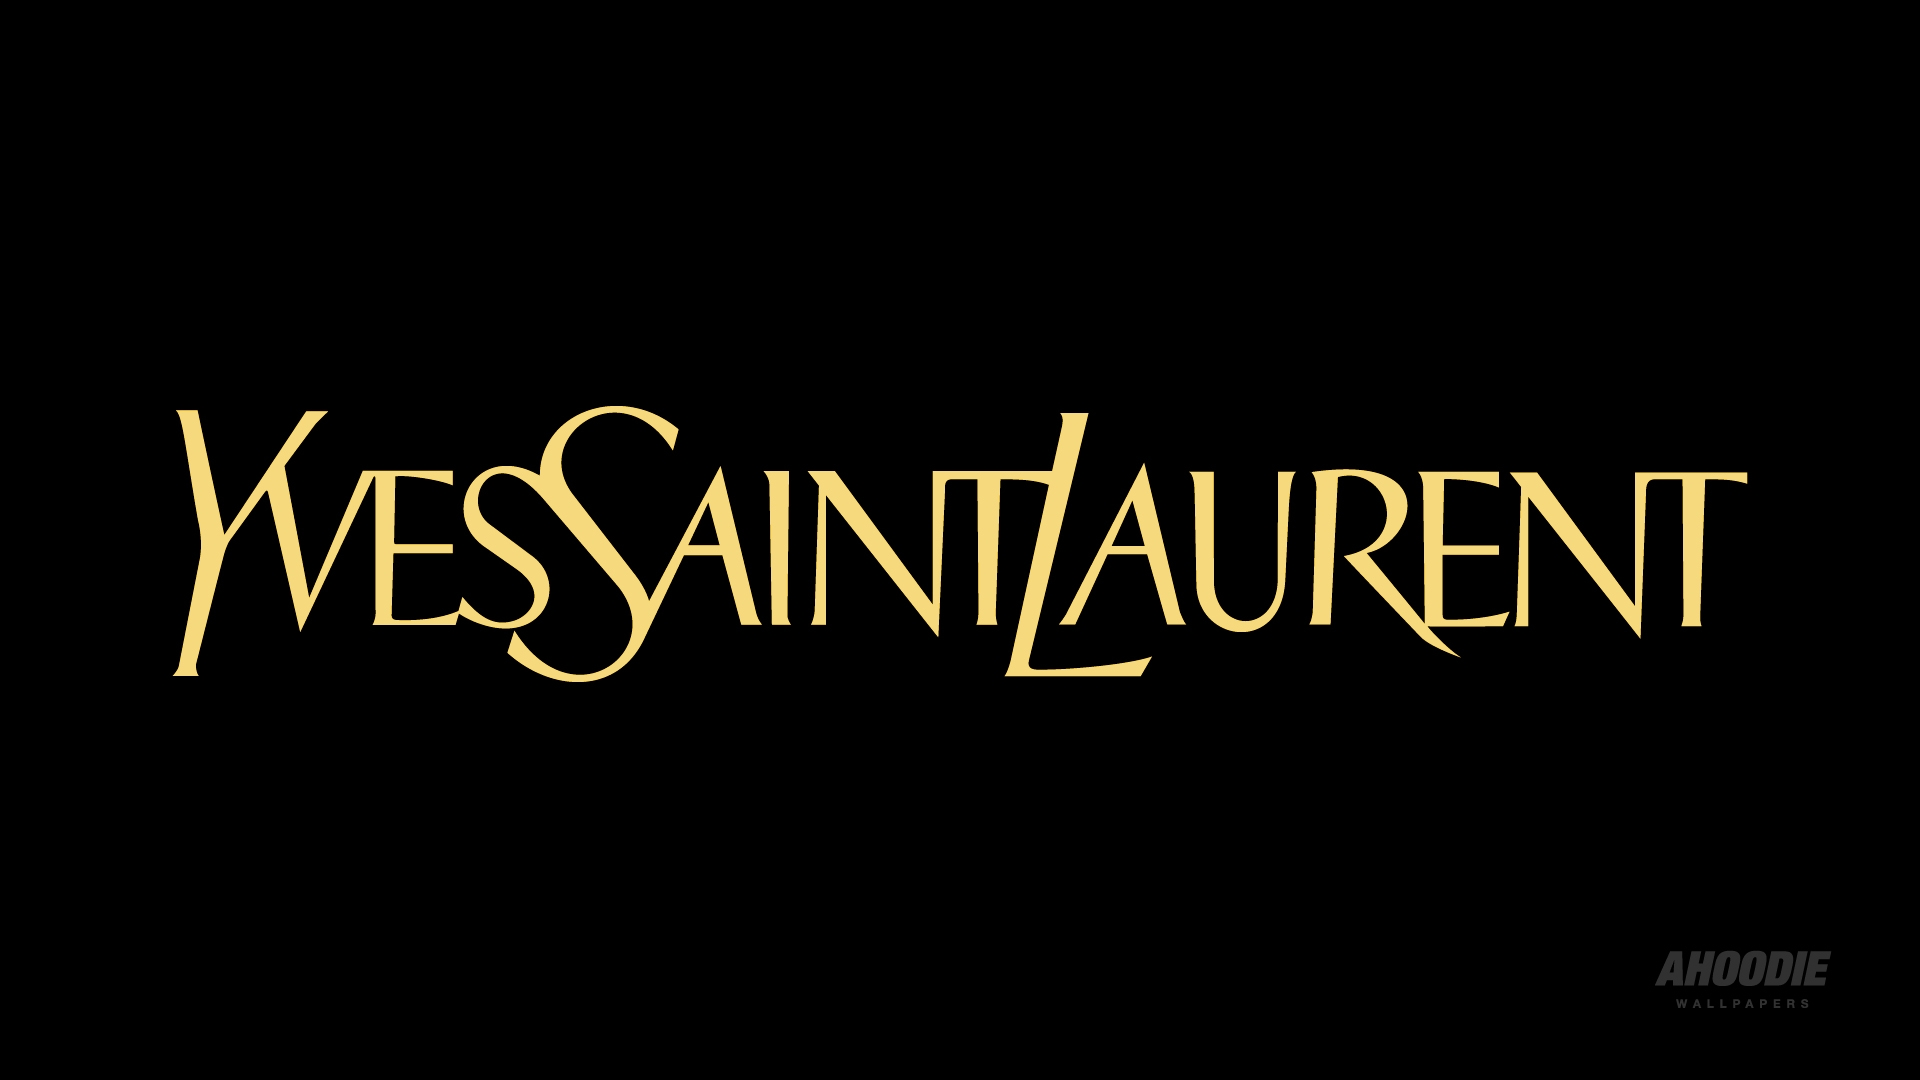 Adidas Logo 3d Wallpapers Hd Fond D 233 Cran Yves Saint Laurent Marque Designer